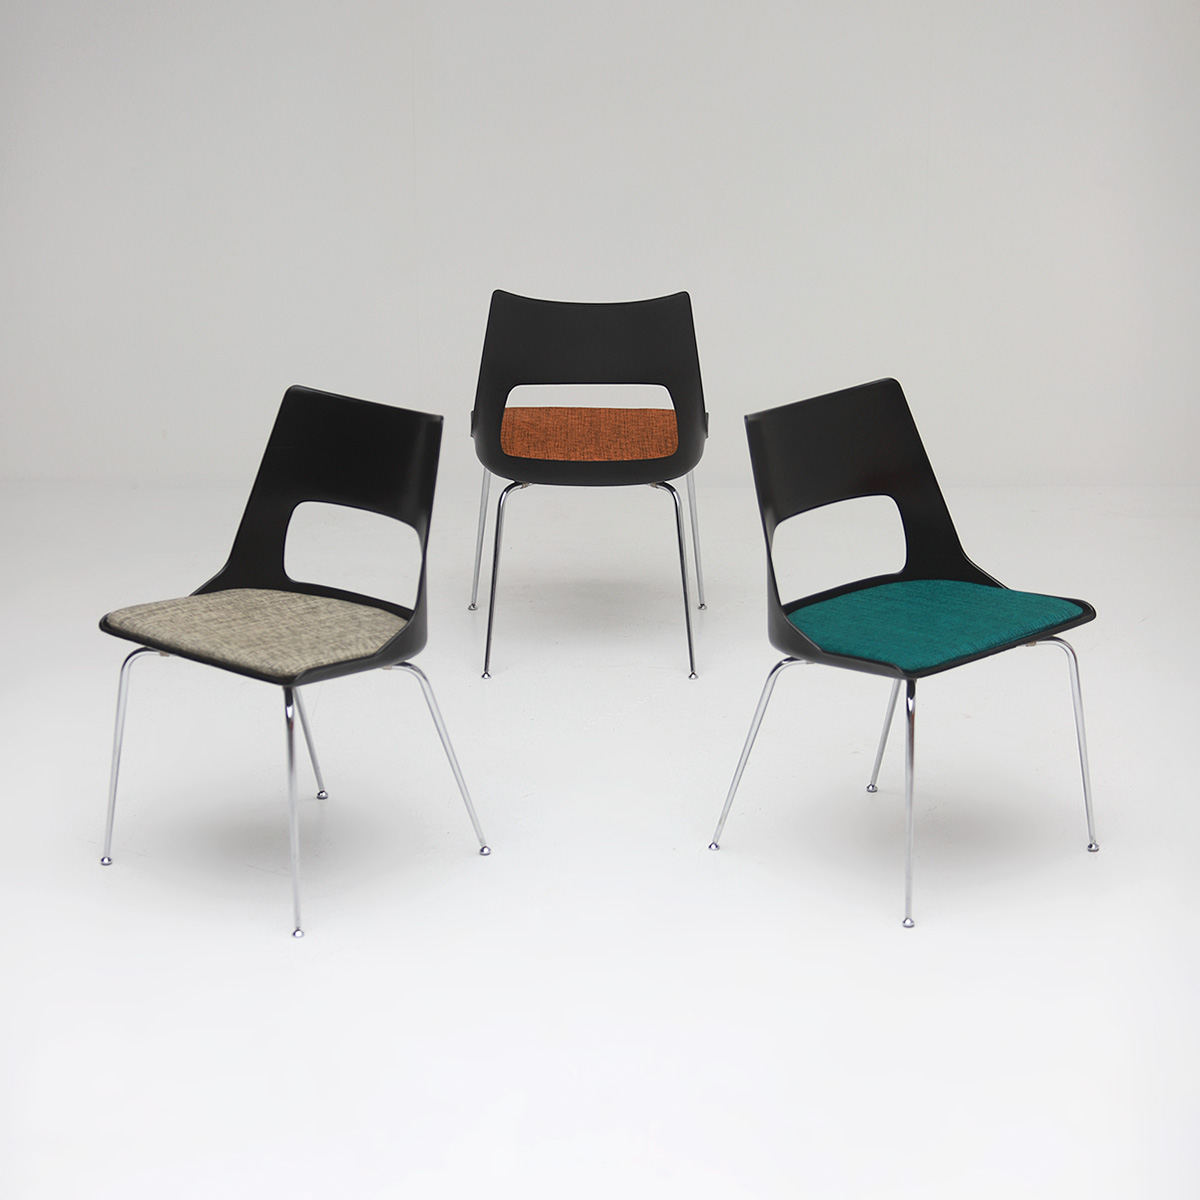 Set of three Modern Kay Korbing chairs for Fibrex Danmark